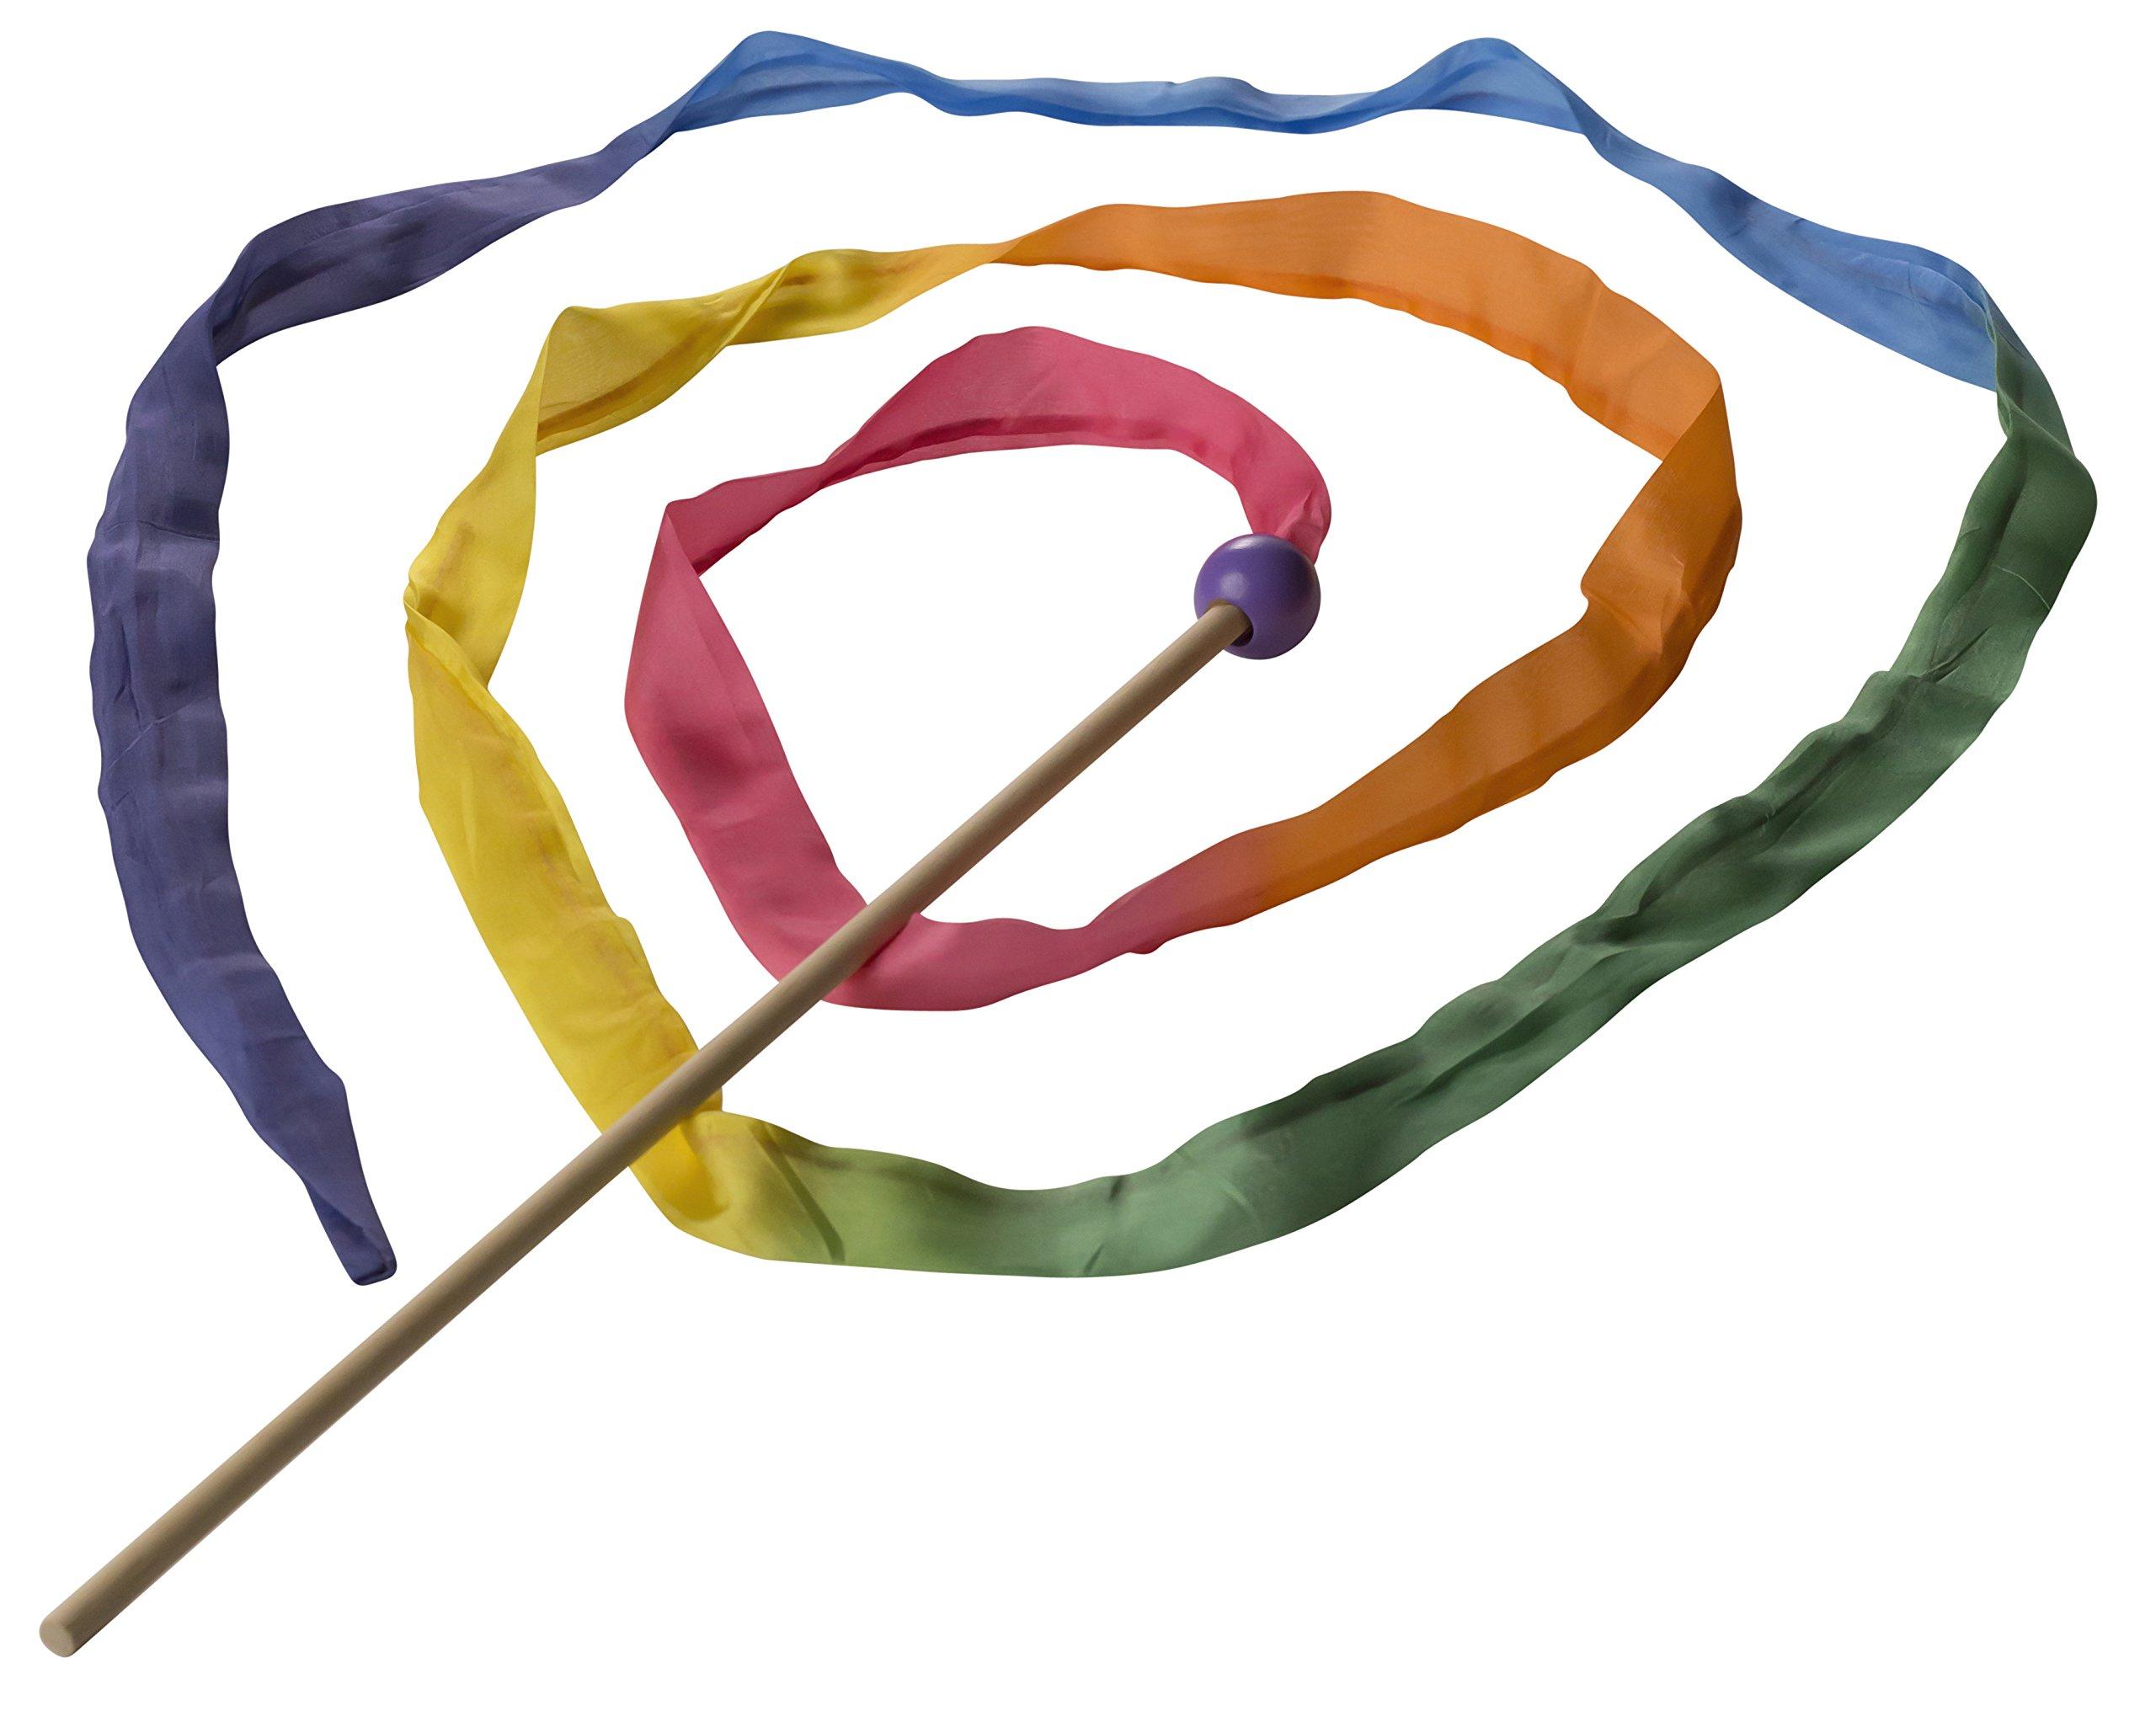 Sarah's Silks 8-Foot Long, Vibrant, Rainbow Silk Streamer